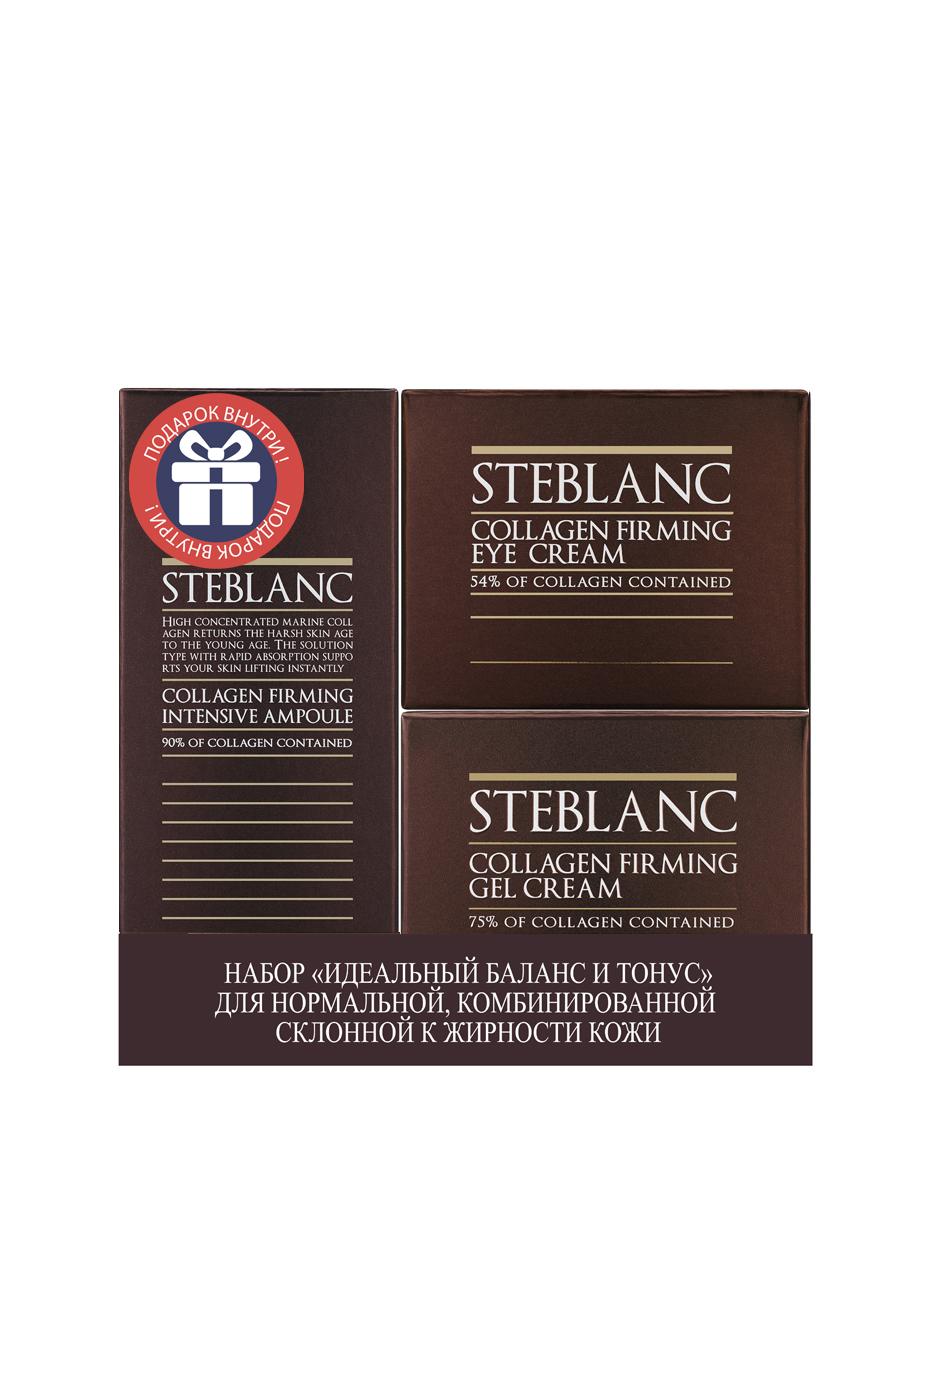 "STEBLANC ����� ��� ����������, ��������������� �������� � �������� ���� ""��������� ������ � �����""~"